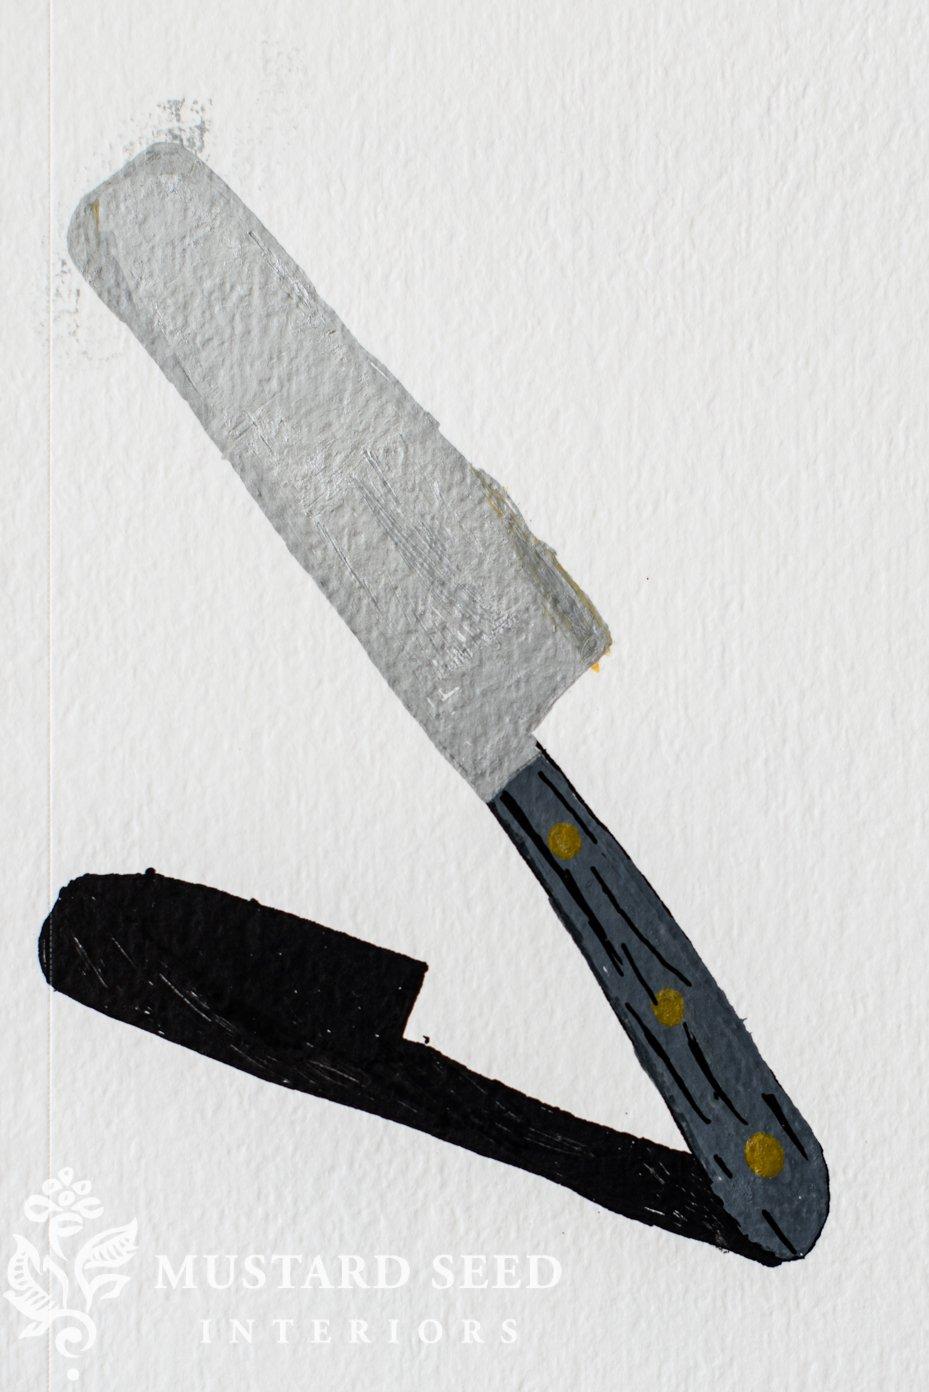 acrylic paint sketch | domestika illustration class | miss mustard seed